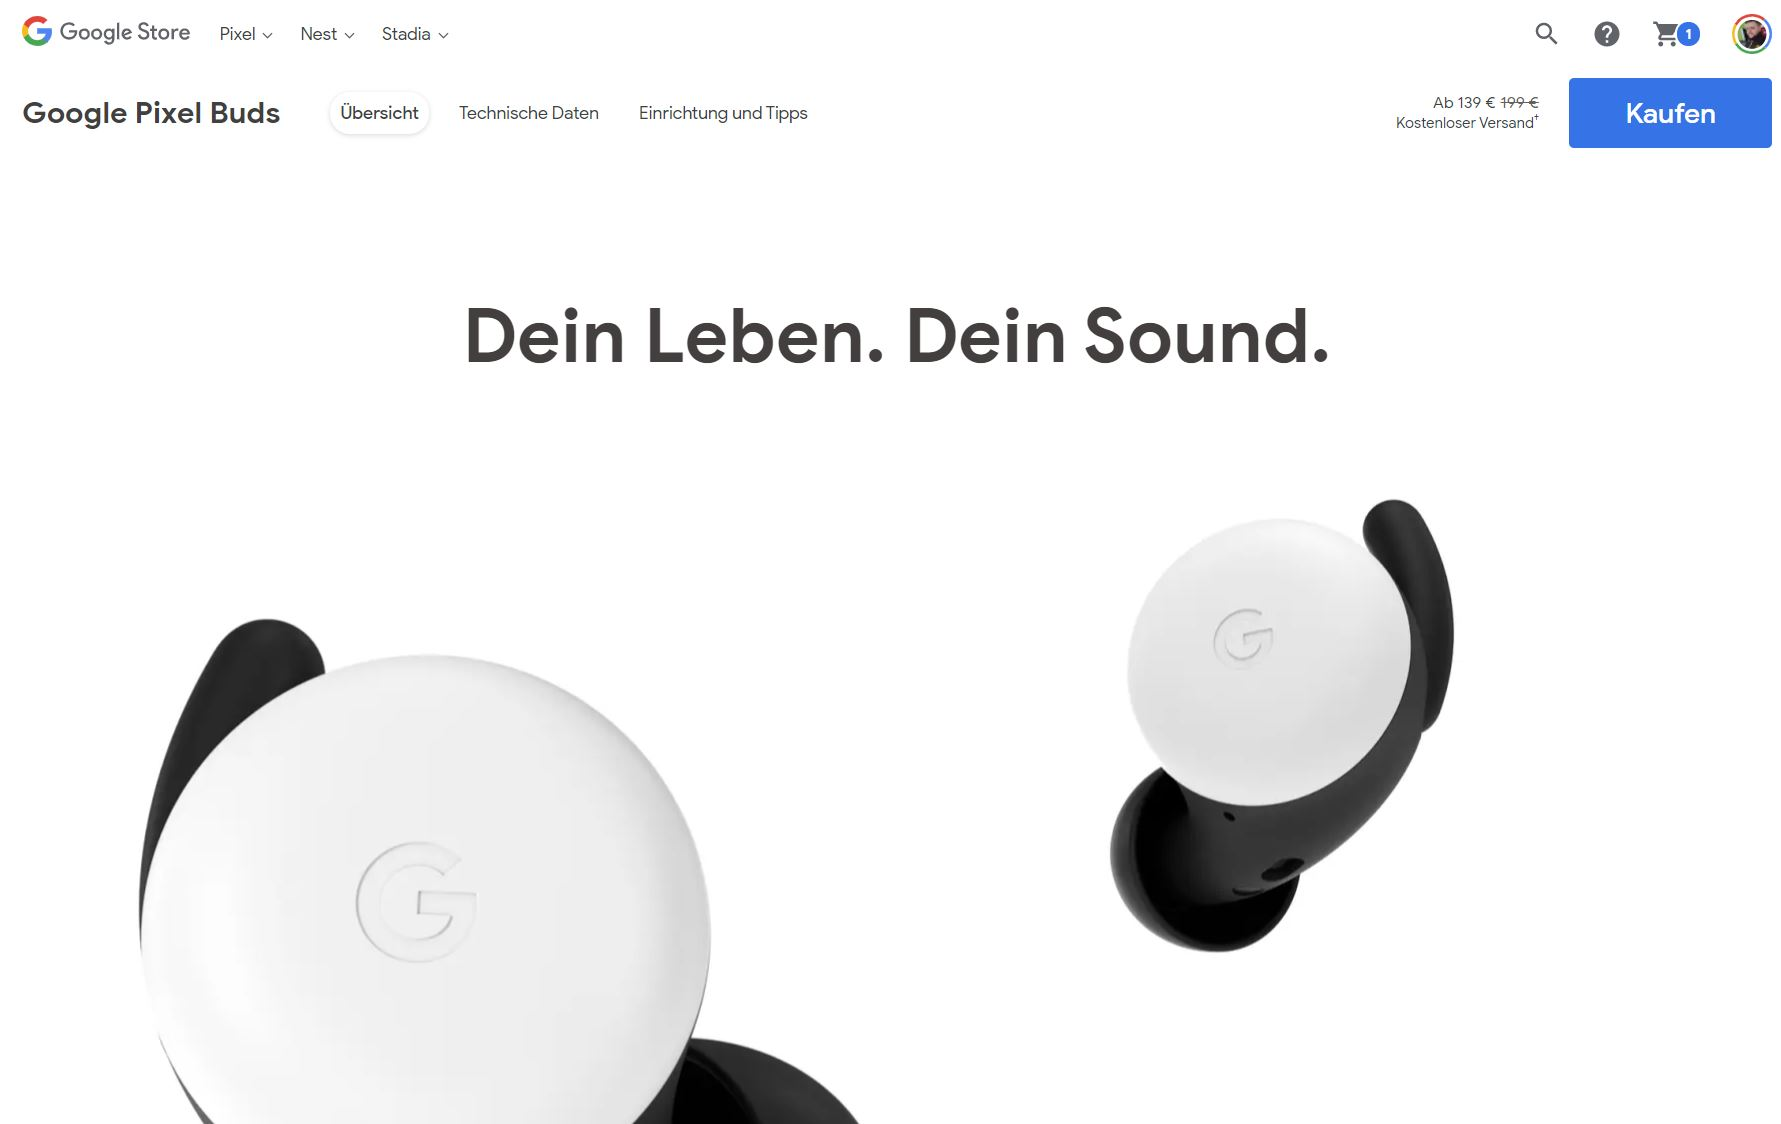 Google reduziert Pixel Buds um 60 Euro